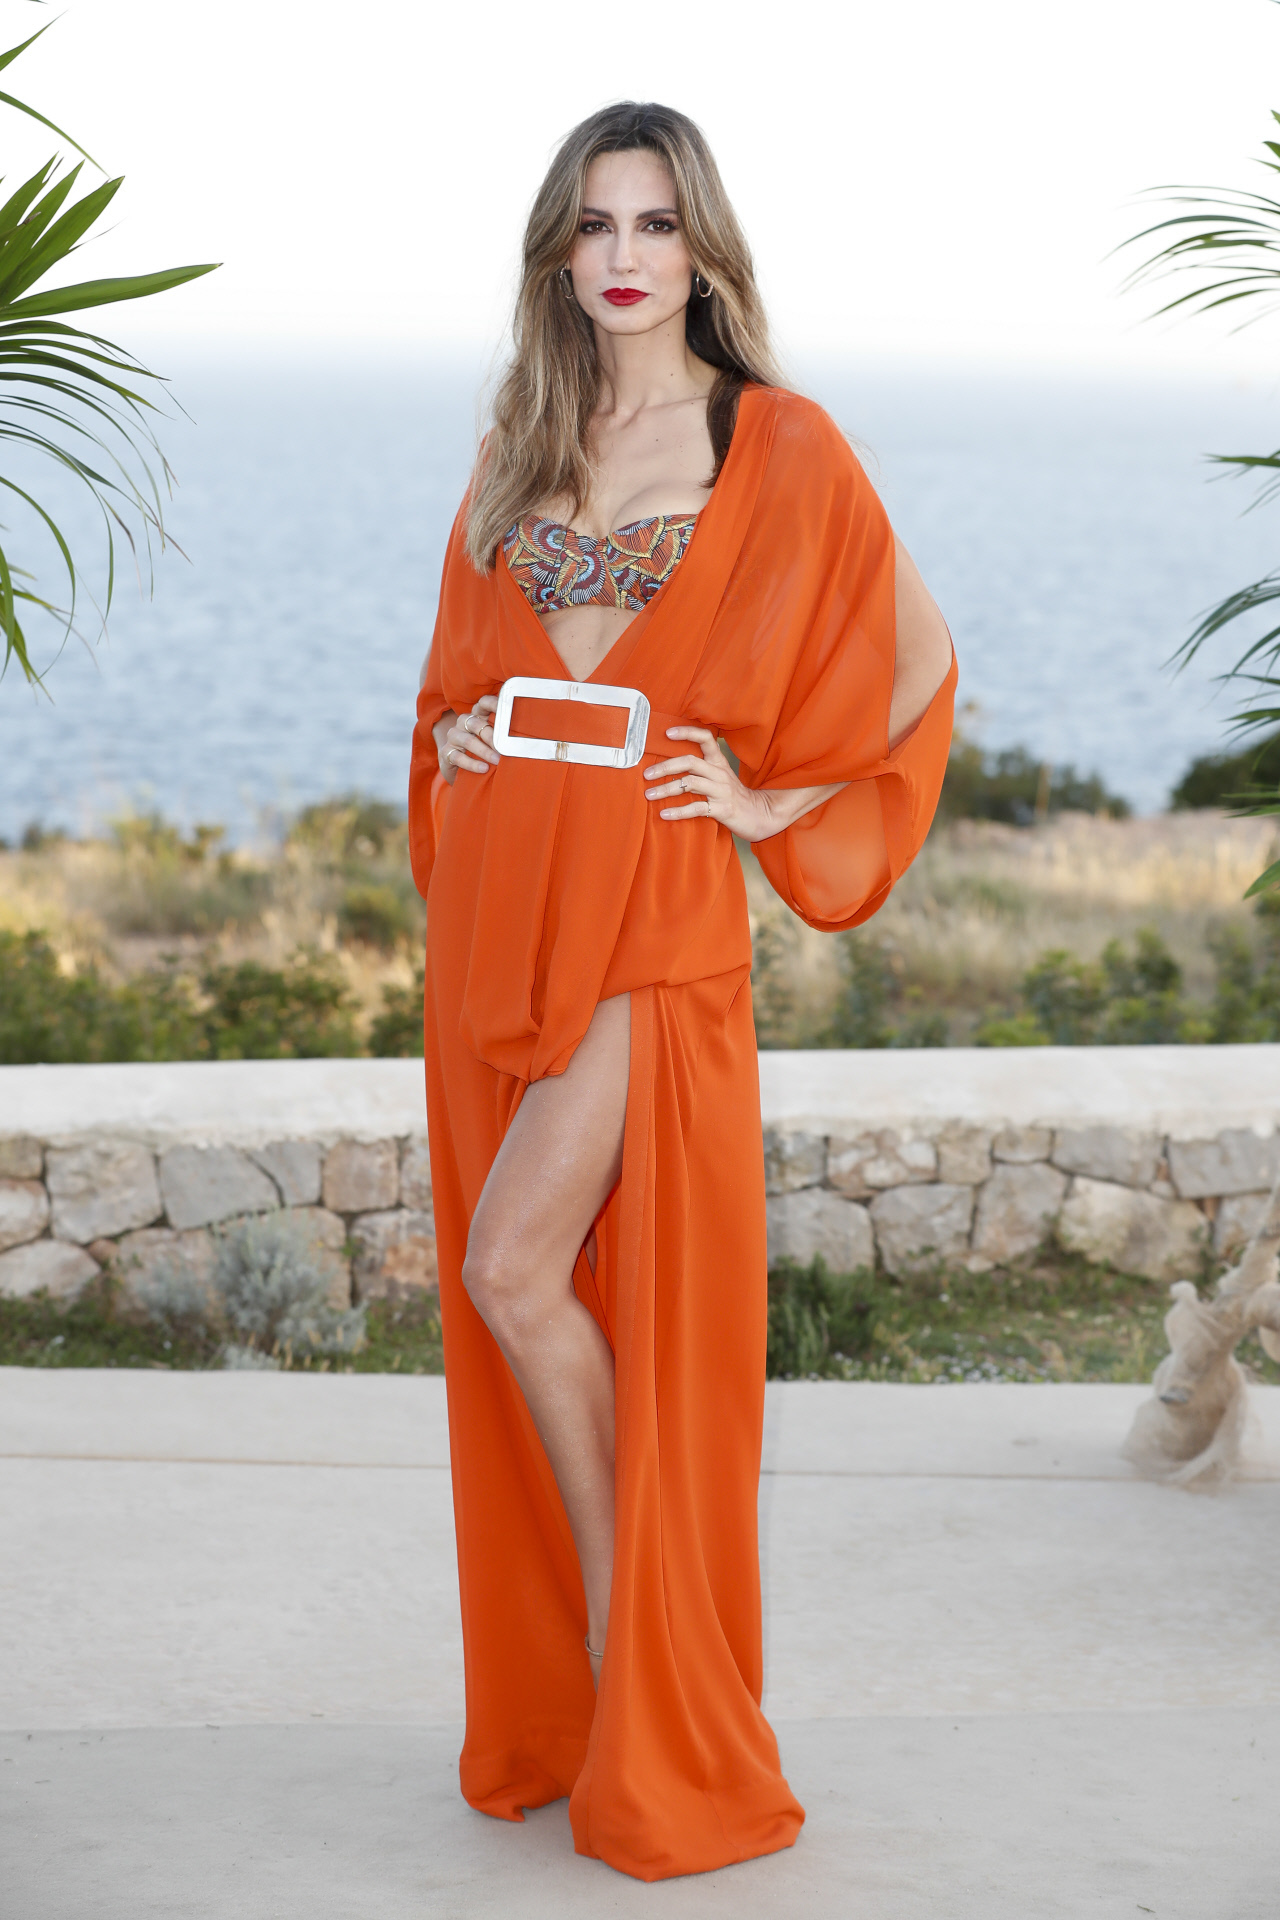 La modelo Ariadne Artiles.